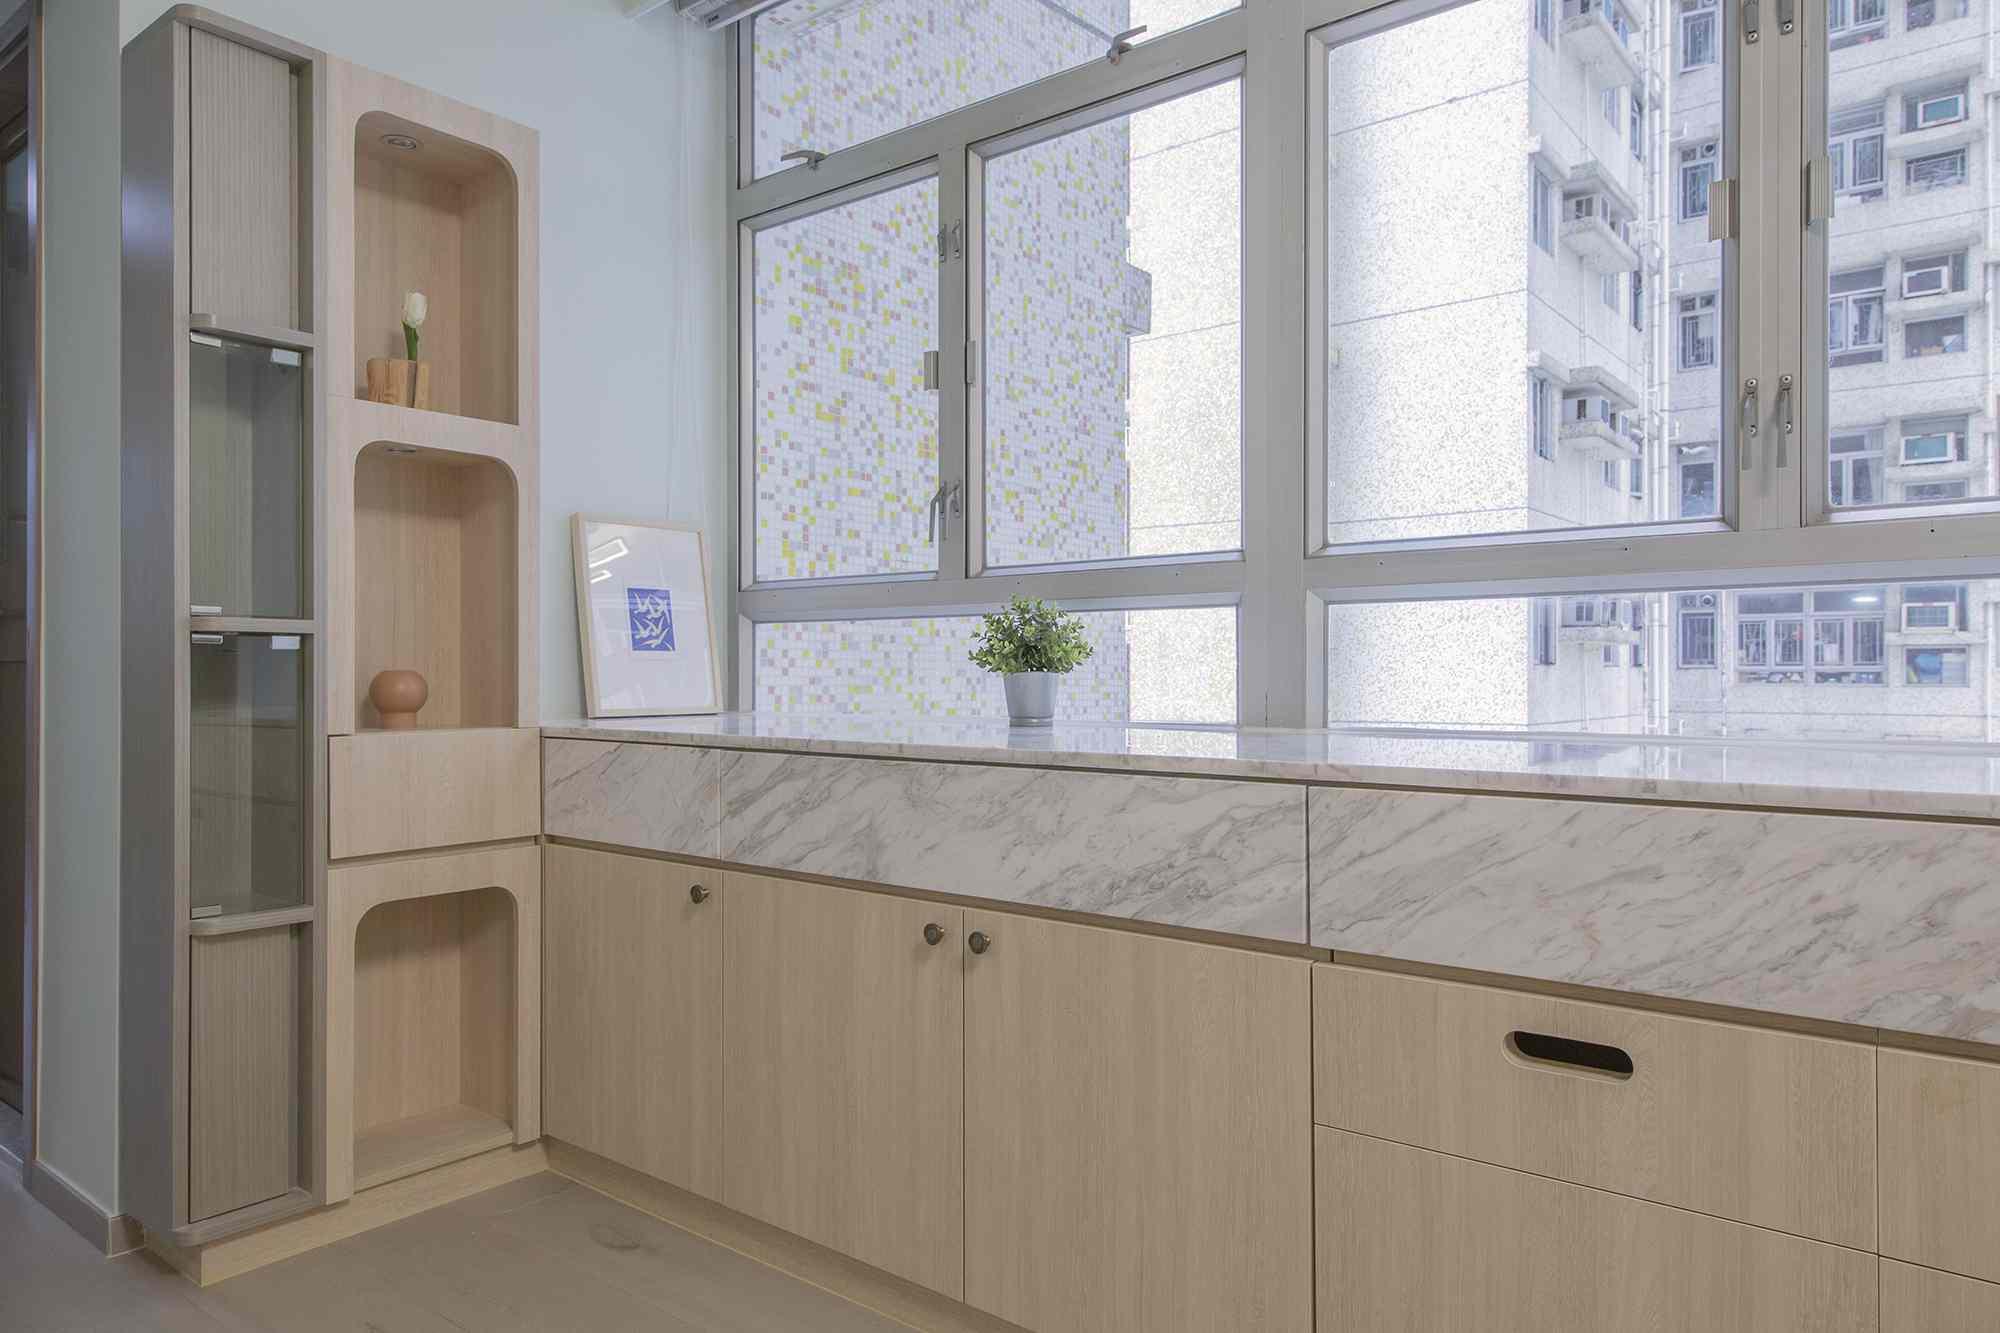 Floral Aged House apartment renovation by Sim-Plex Design Studio family shrine